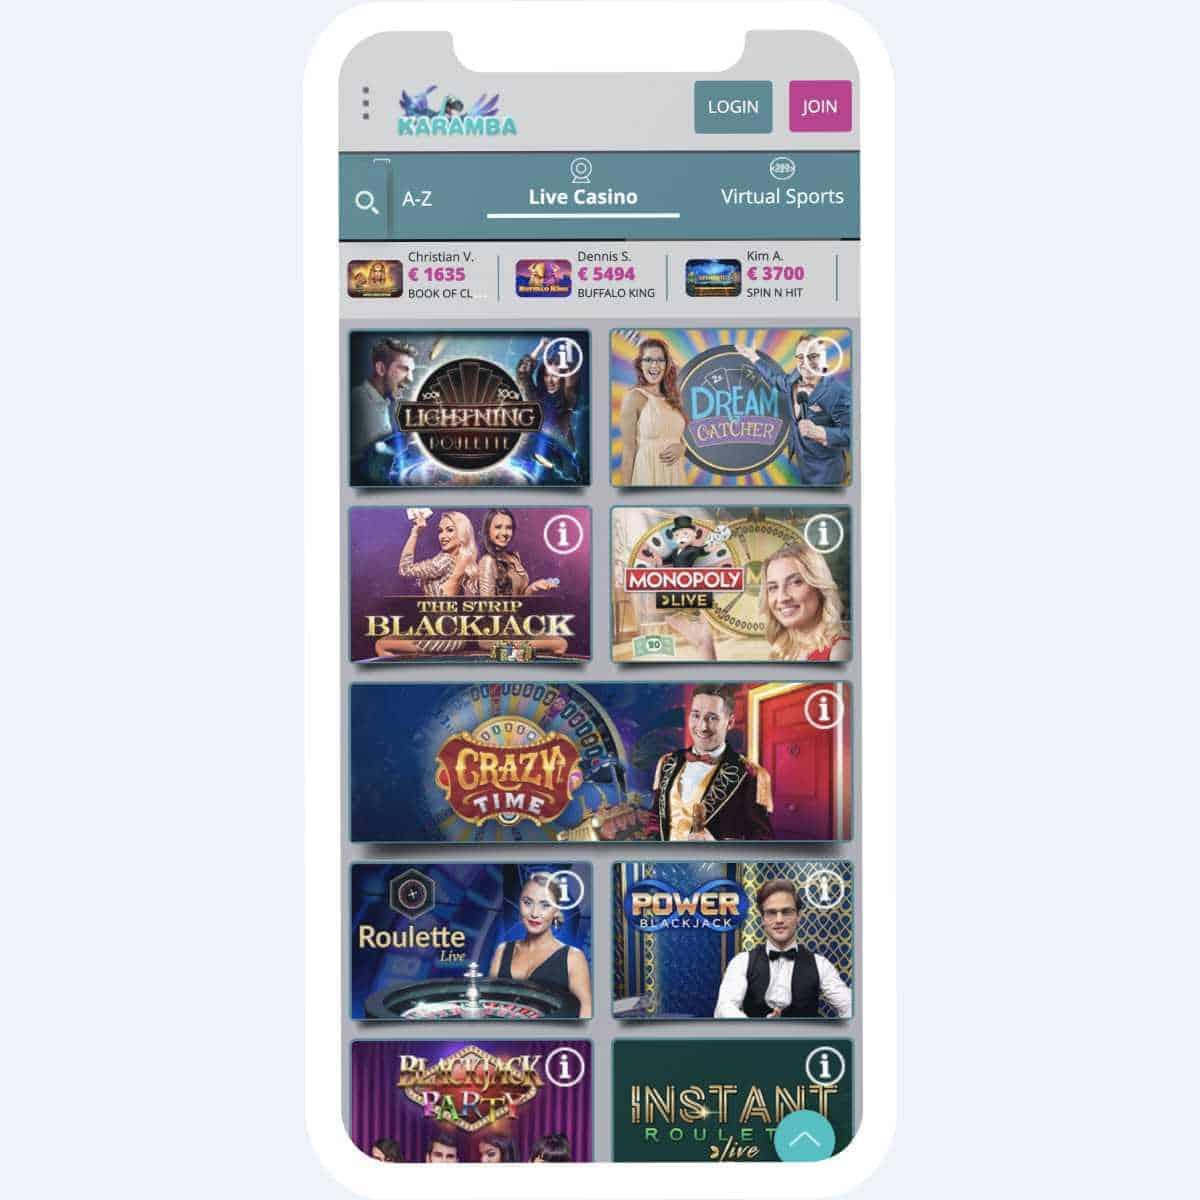 karamba games mobile